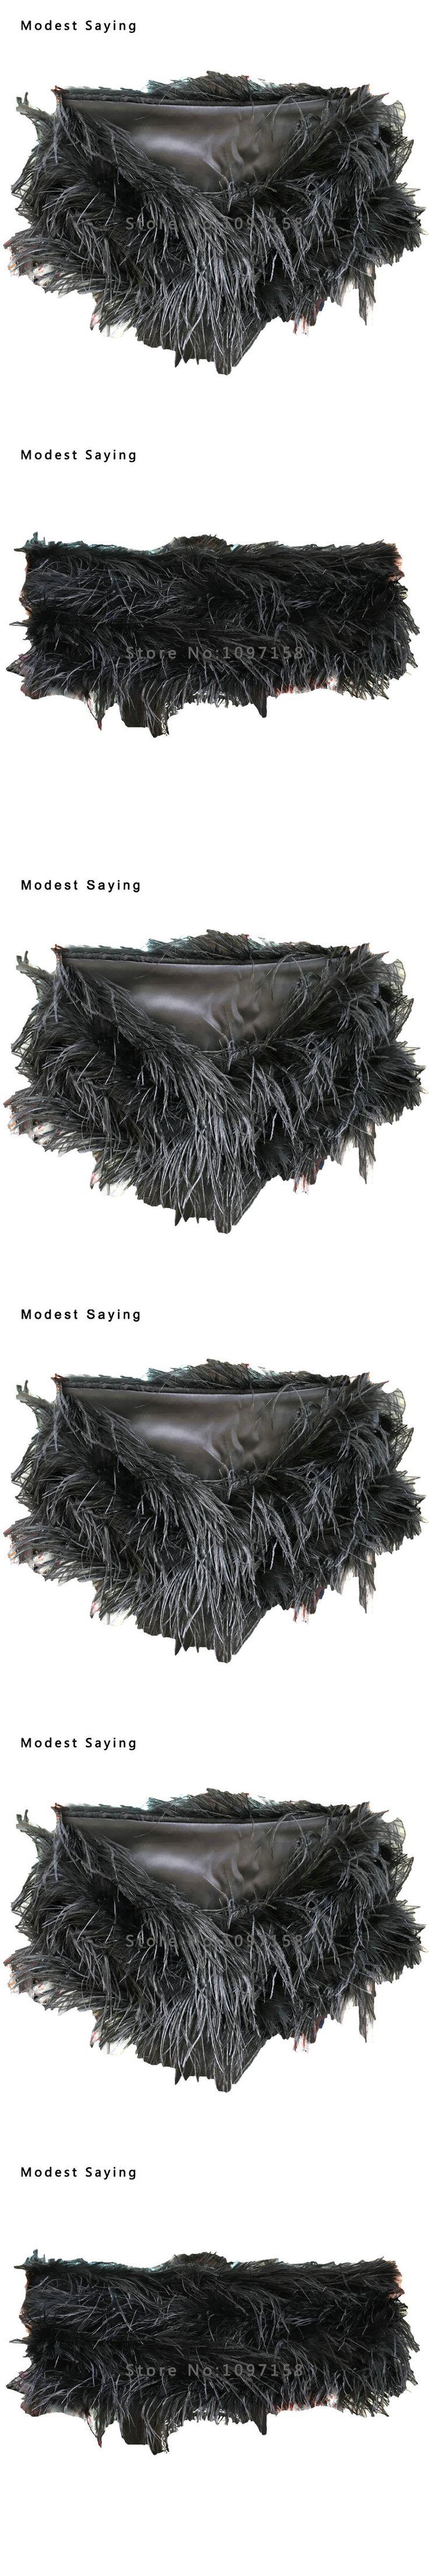 Real Elegant Black Ostrich Feather Coats Wedding Fur Bolero bolero 2017 Bridal Shawl Wraps for evening dresses cape mariage YB3